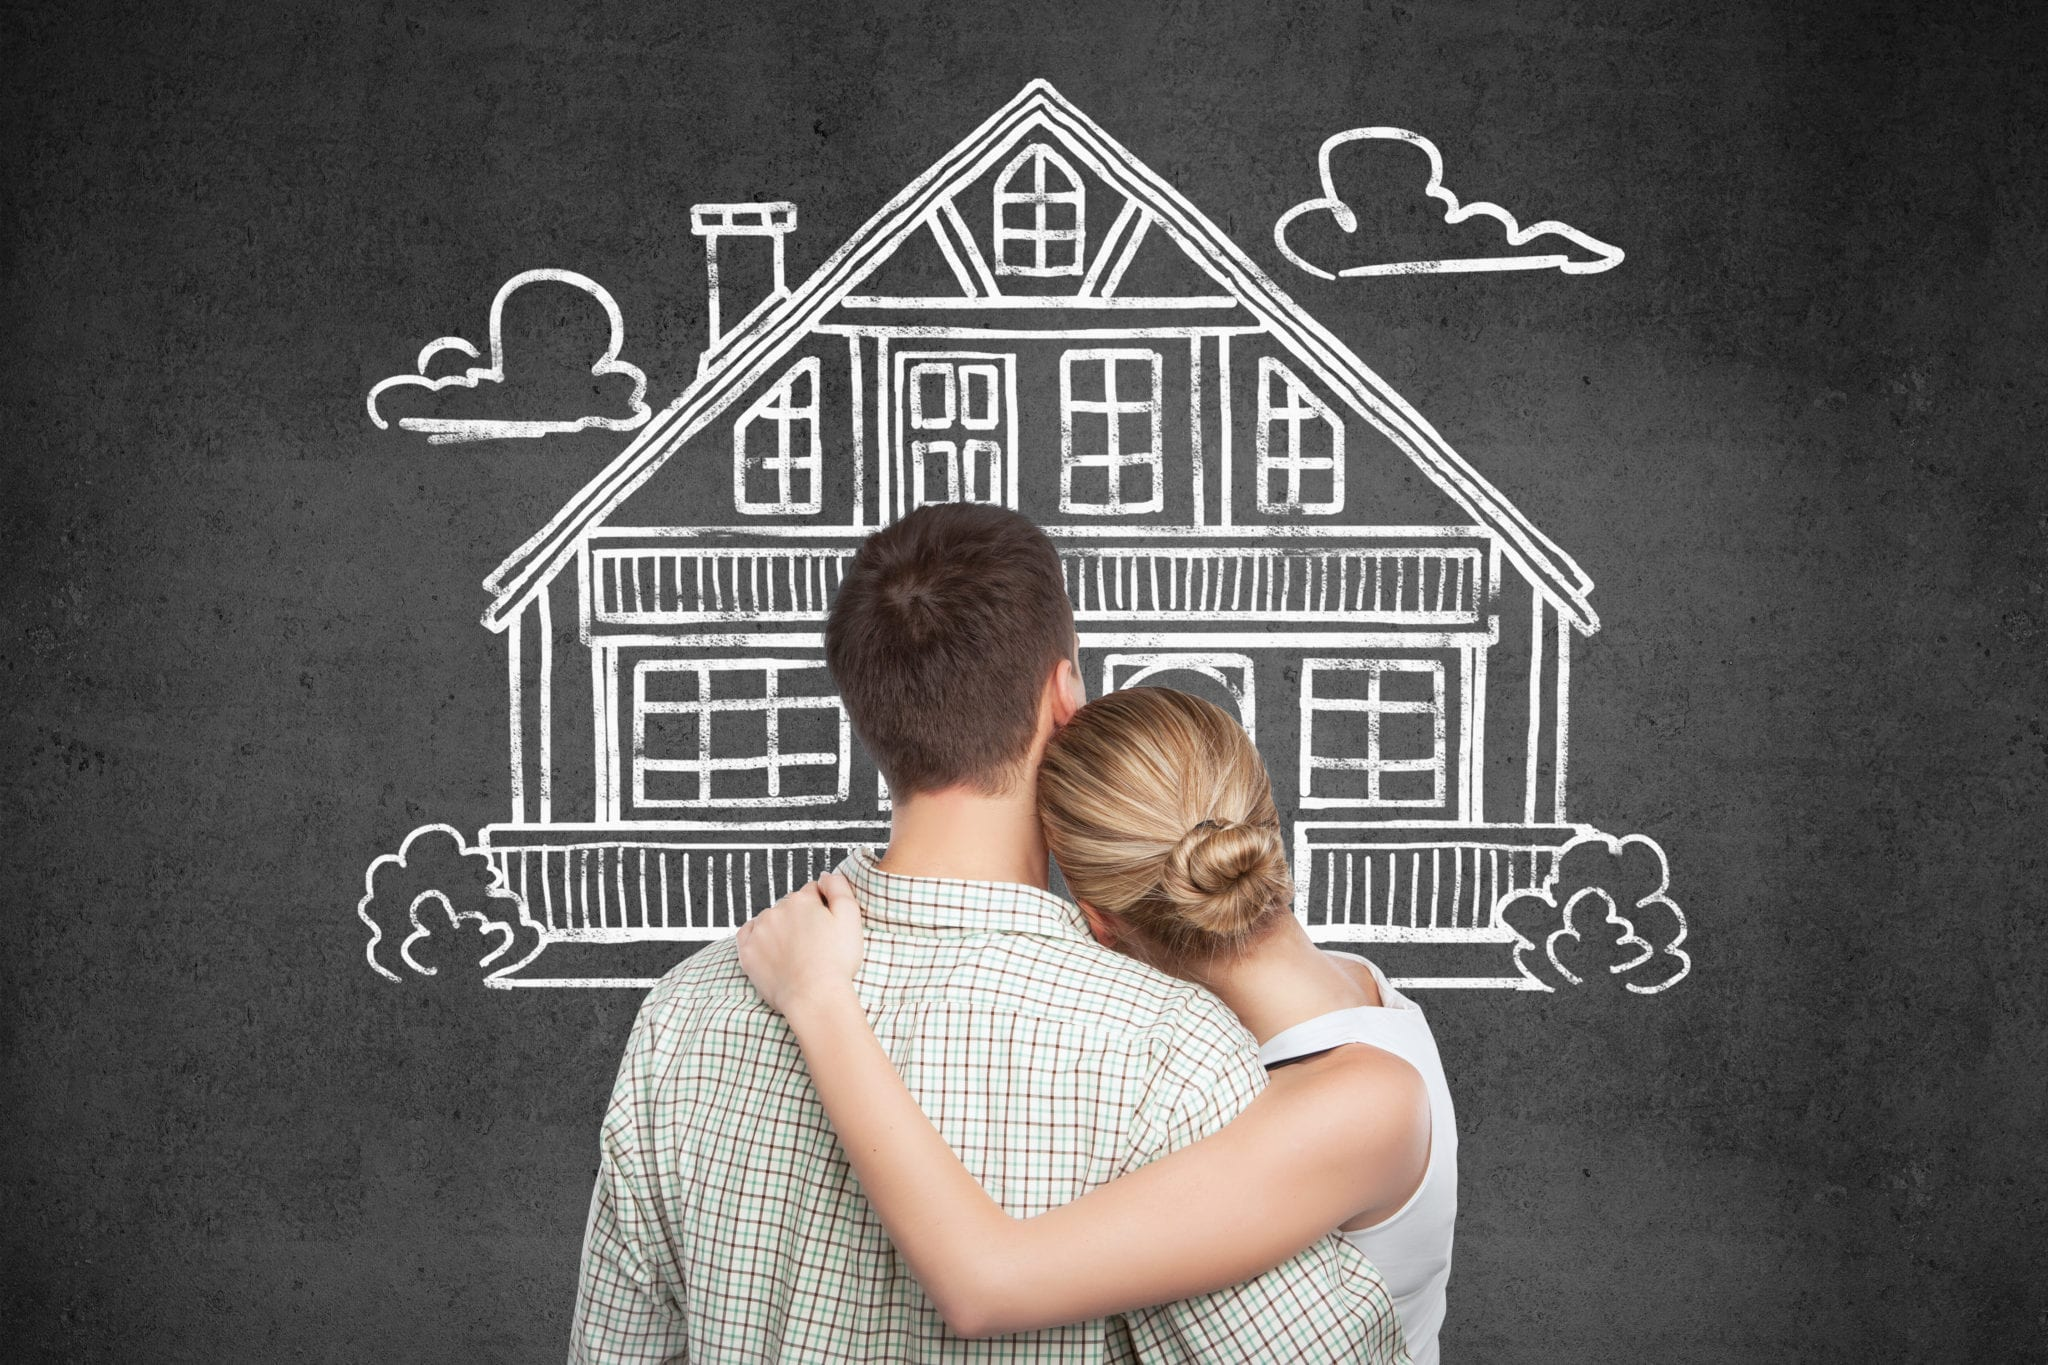 real estate investing basics - north florida land for sale